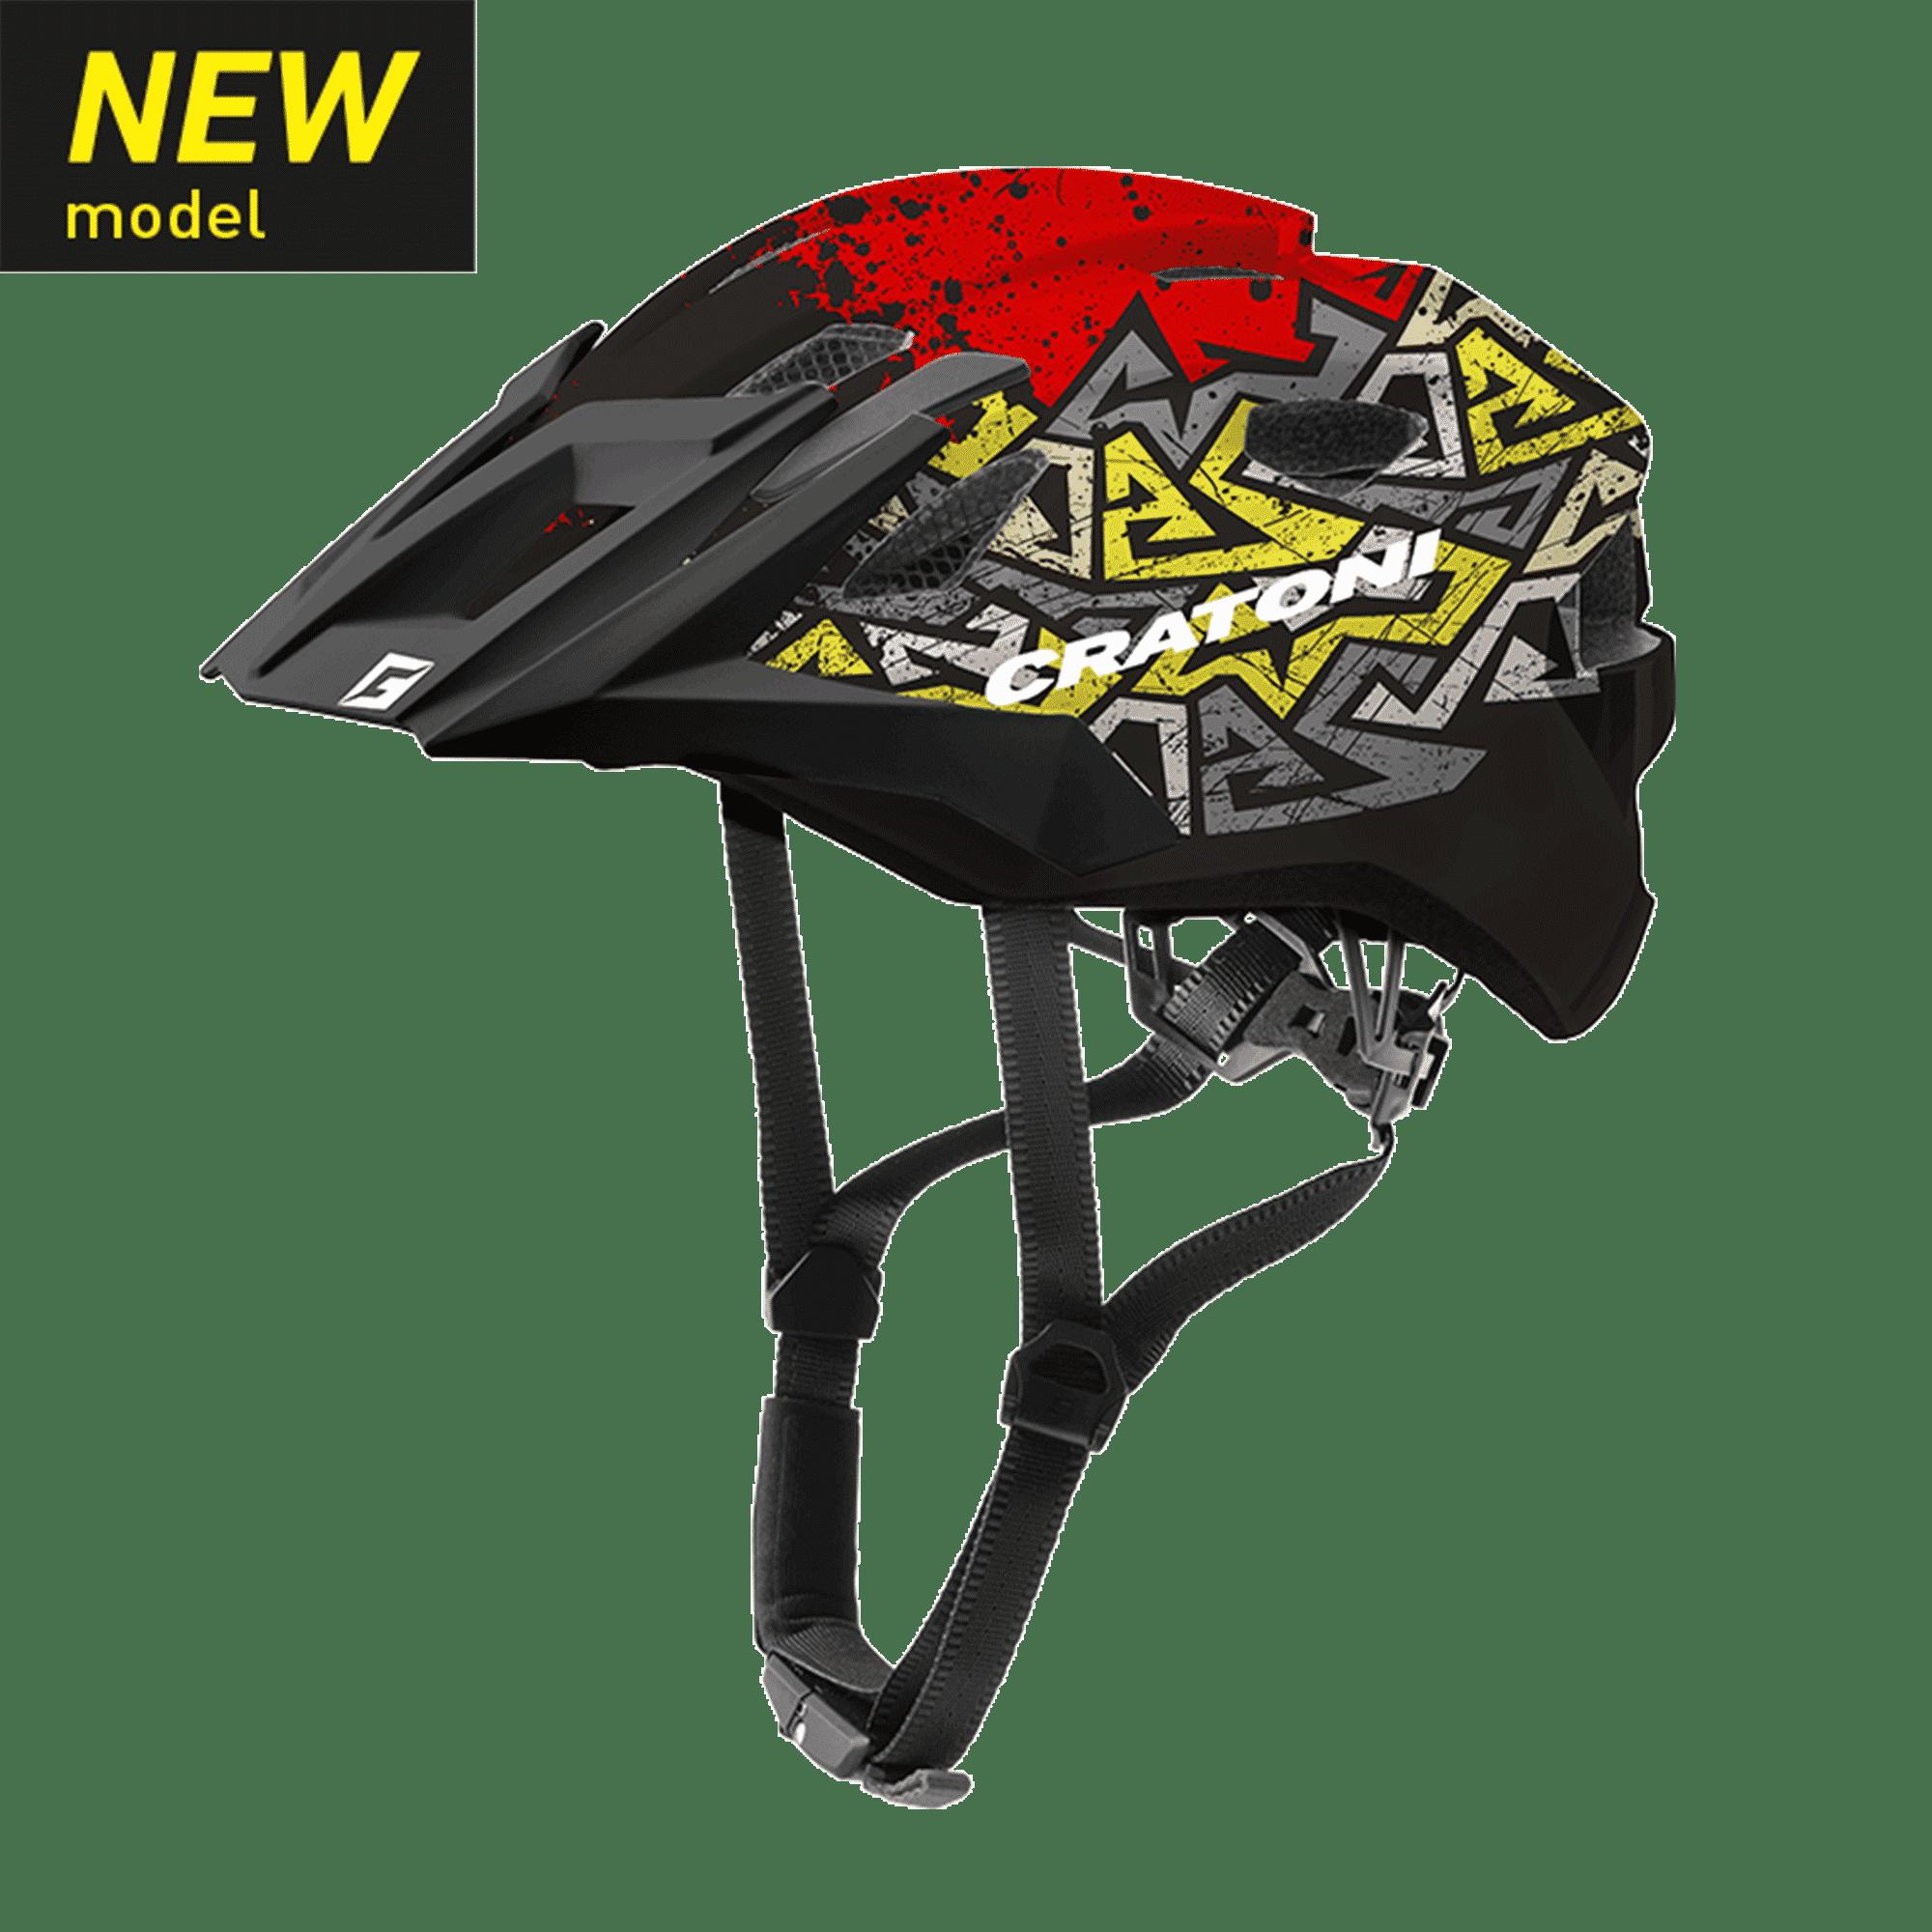 Helm Cratoni AllRide Jr. wild red matt new model